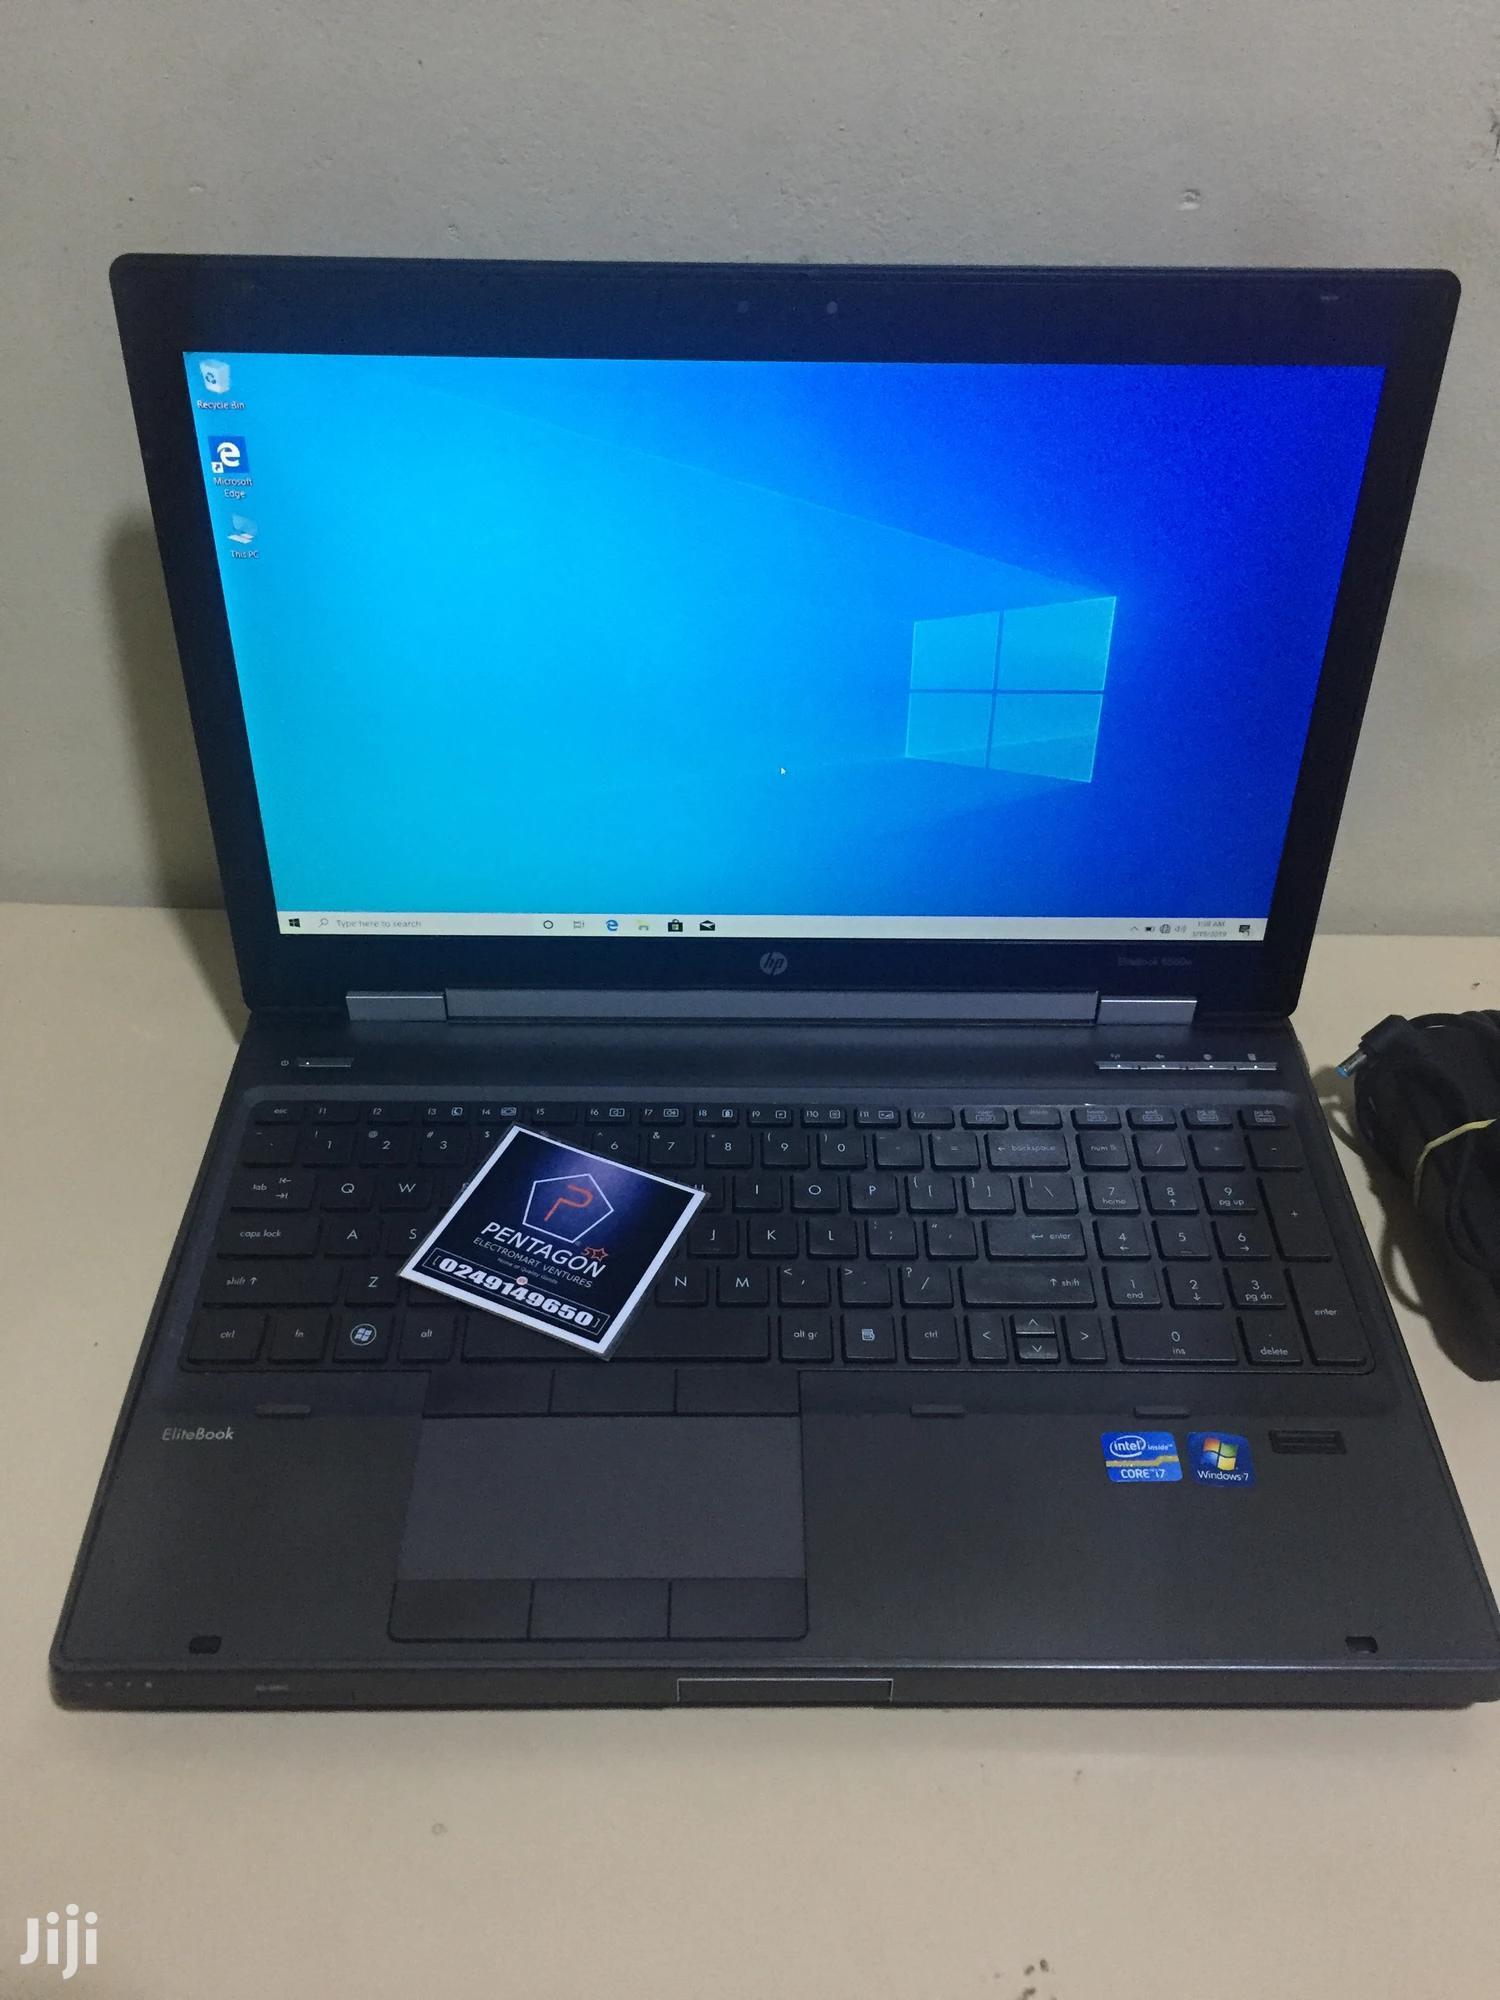 Laptop HP EliteBook 8560W 8GB Intel Core I7 HDD 500GB | Laptops & Computers for sale in Kumasi Metropolitan, Ashanti, Ghana